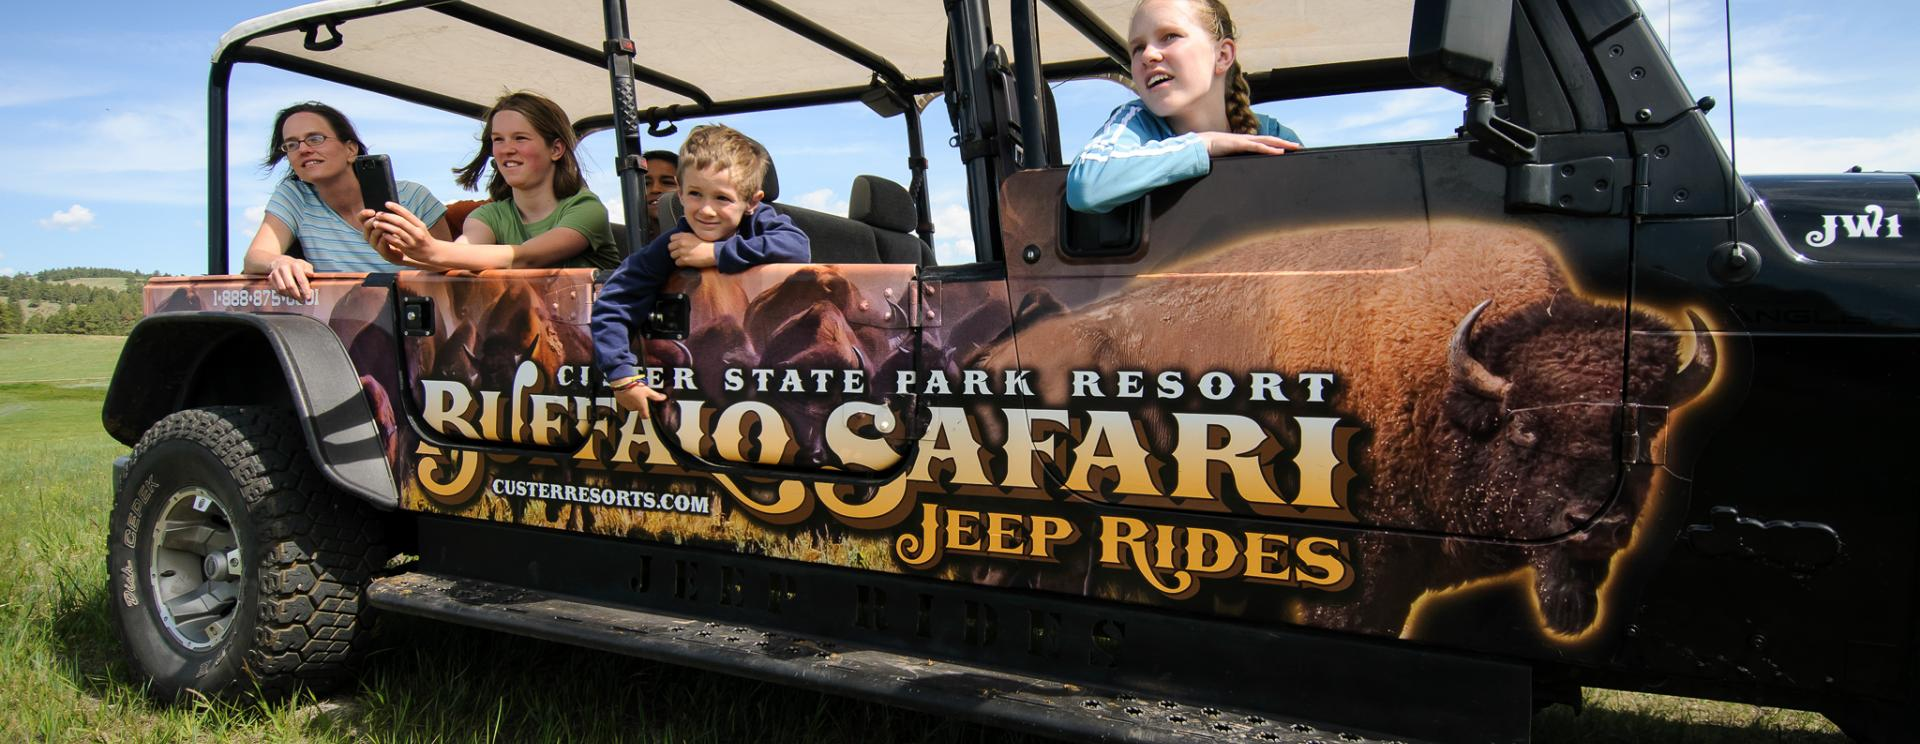 Buffalo Safari Jeep Rides | Custer State Park